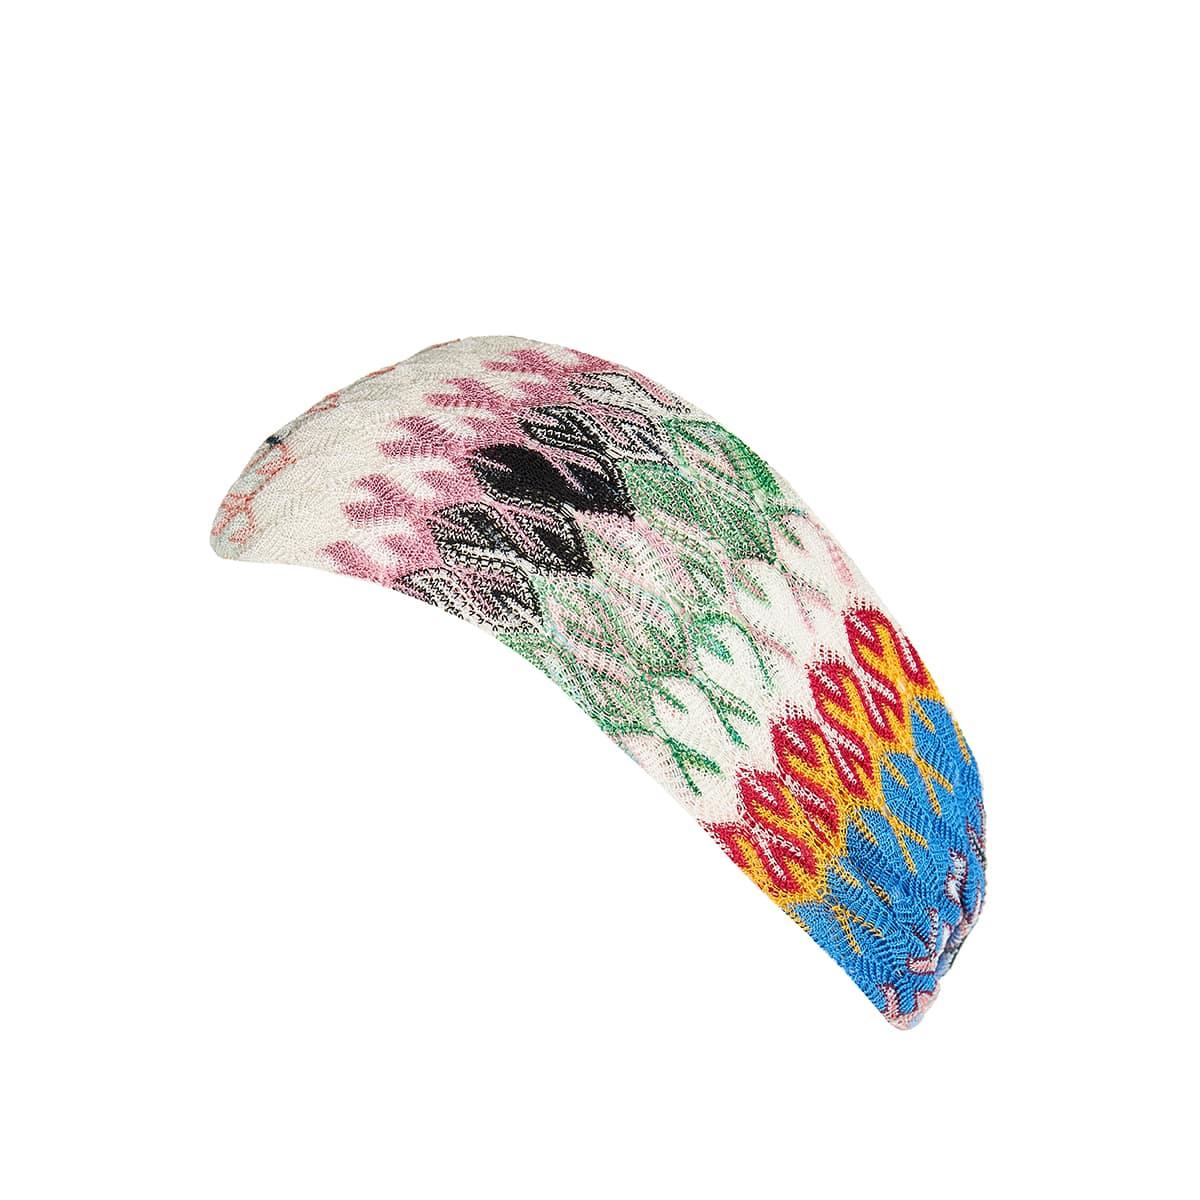 Chevron knitted headband